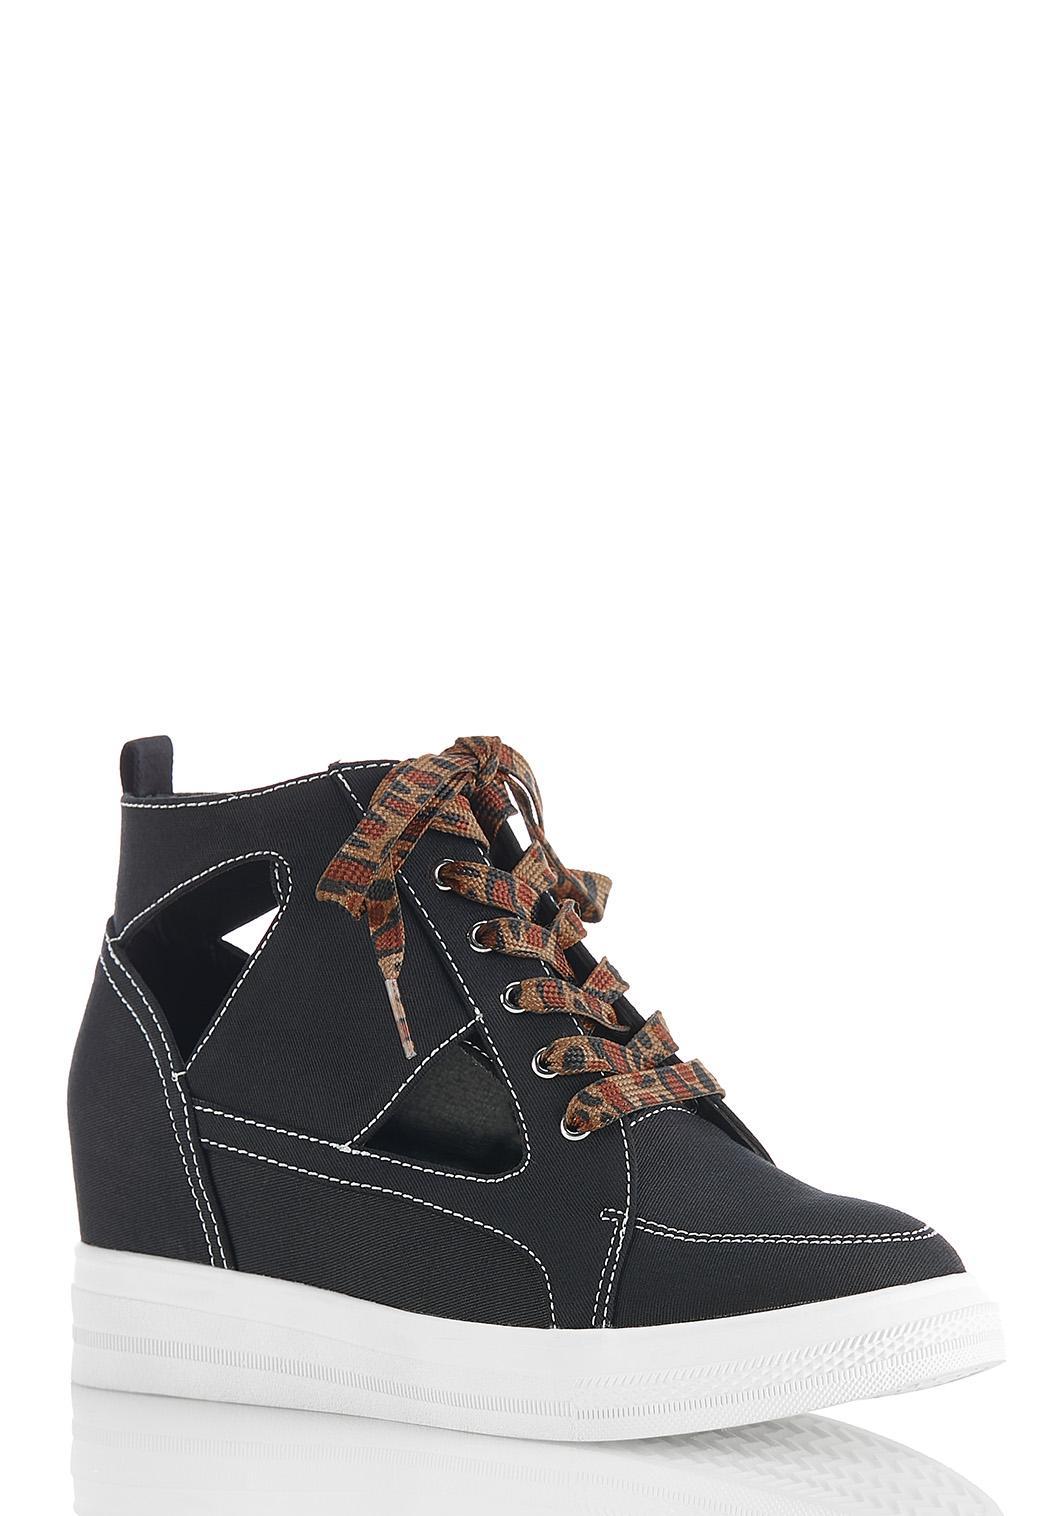 Cutout Wedge Sneakers